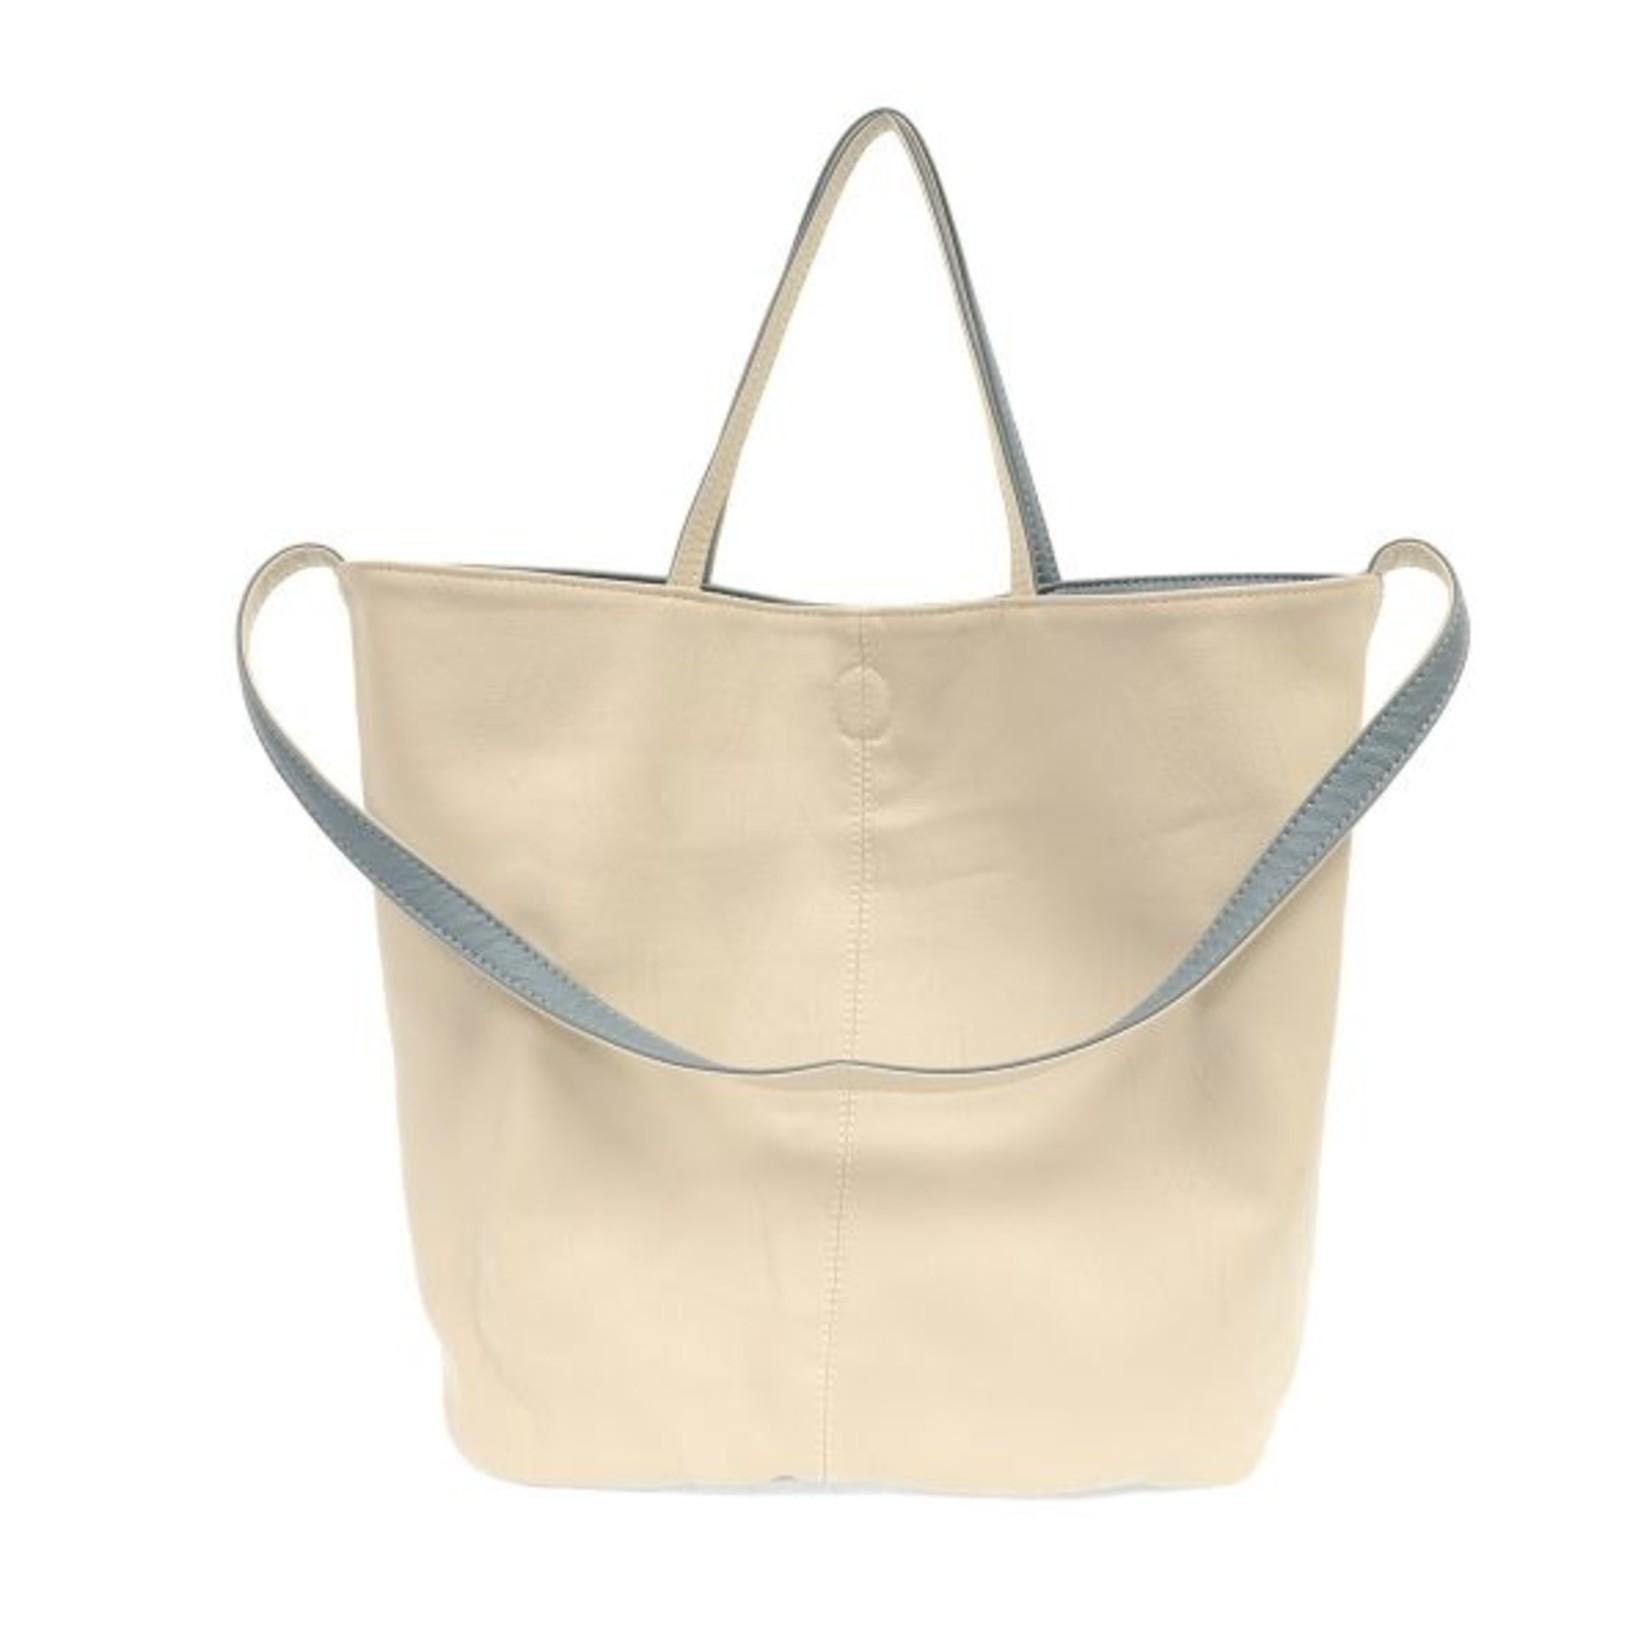 Joy Accessories Riley Reversible Slouchy Hobo Handbag in Chambray